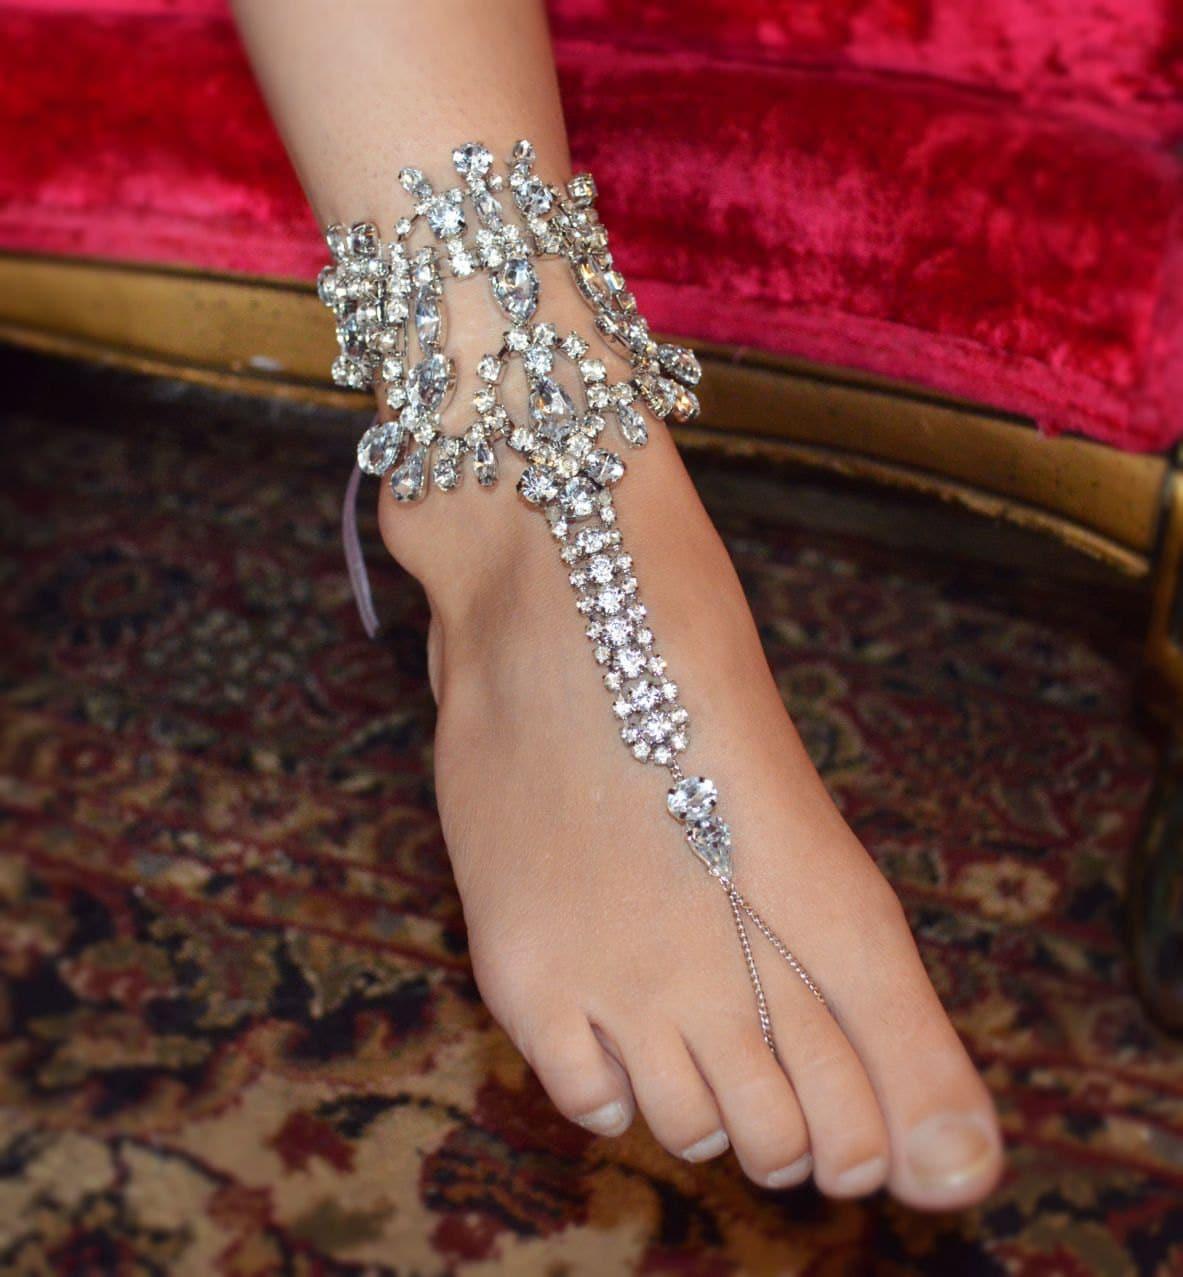 Bridal Shoes Boho: Bohemian WEDDING Bridal Foot Jewelry Rhinestone BAREFOOT